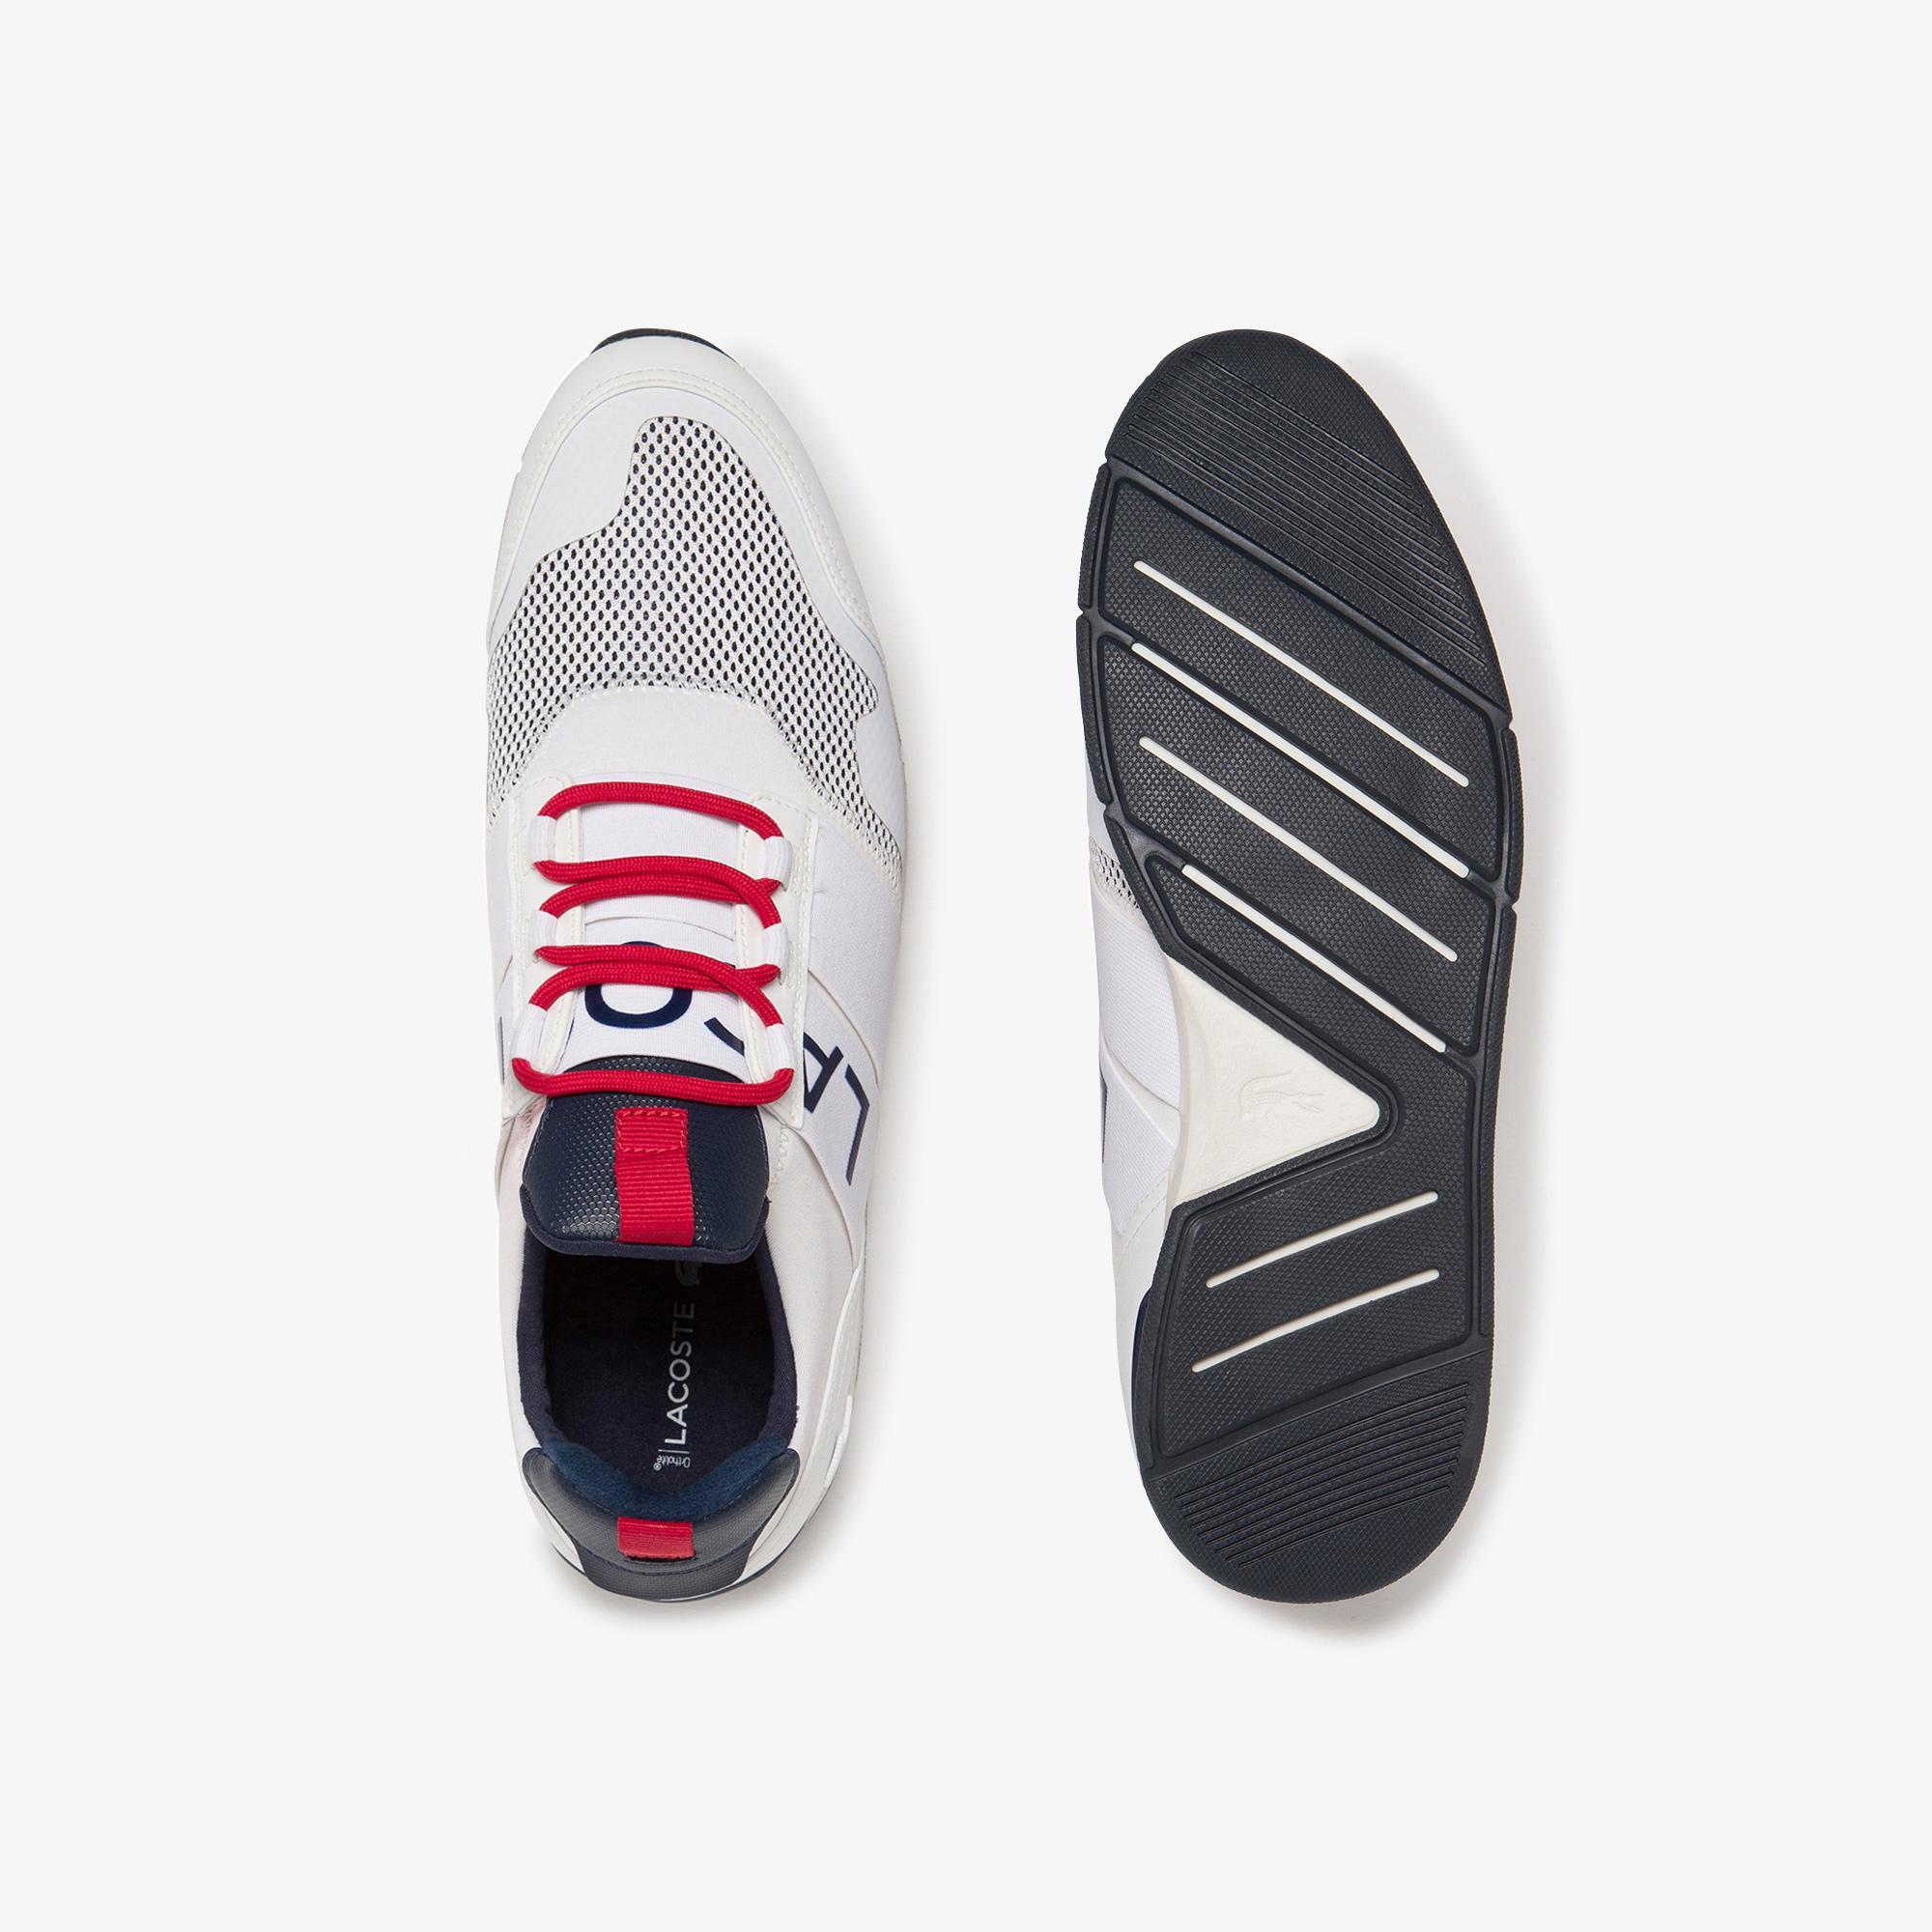 Lacoste Menerva Elite 120 1 Męskie Sneakersy